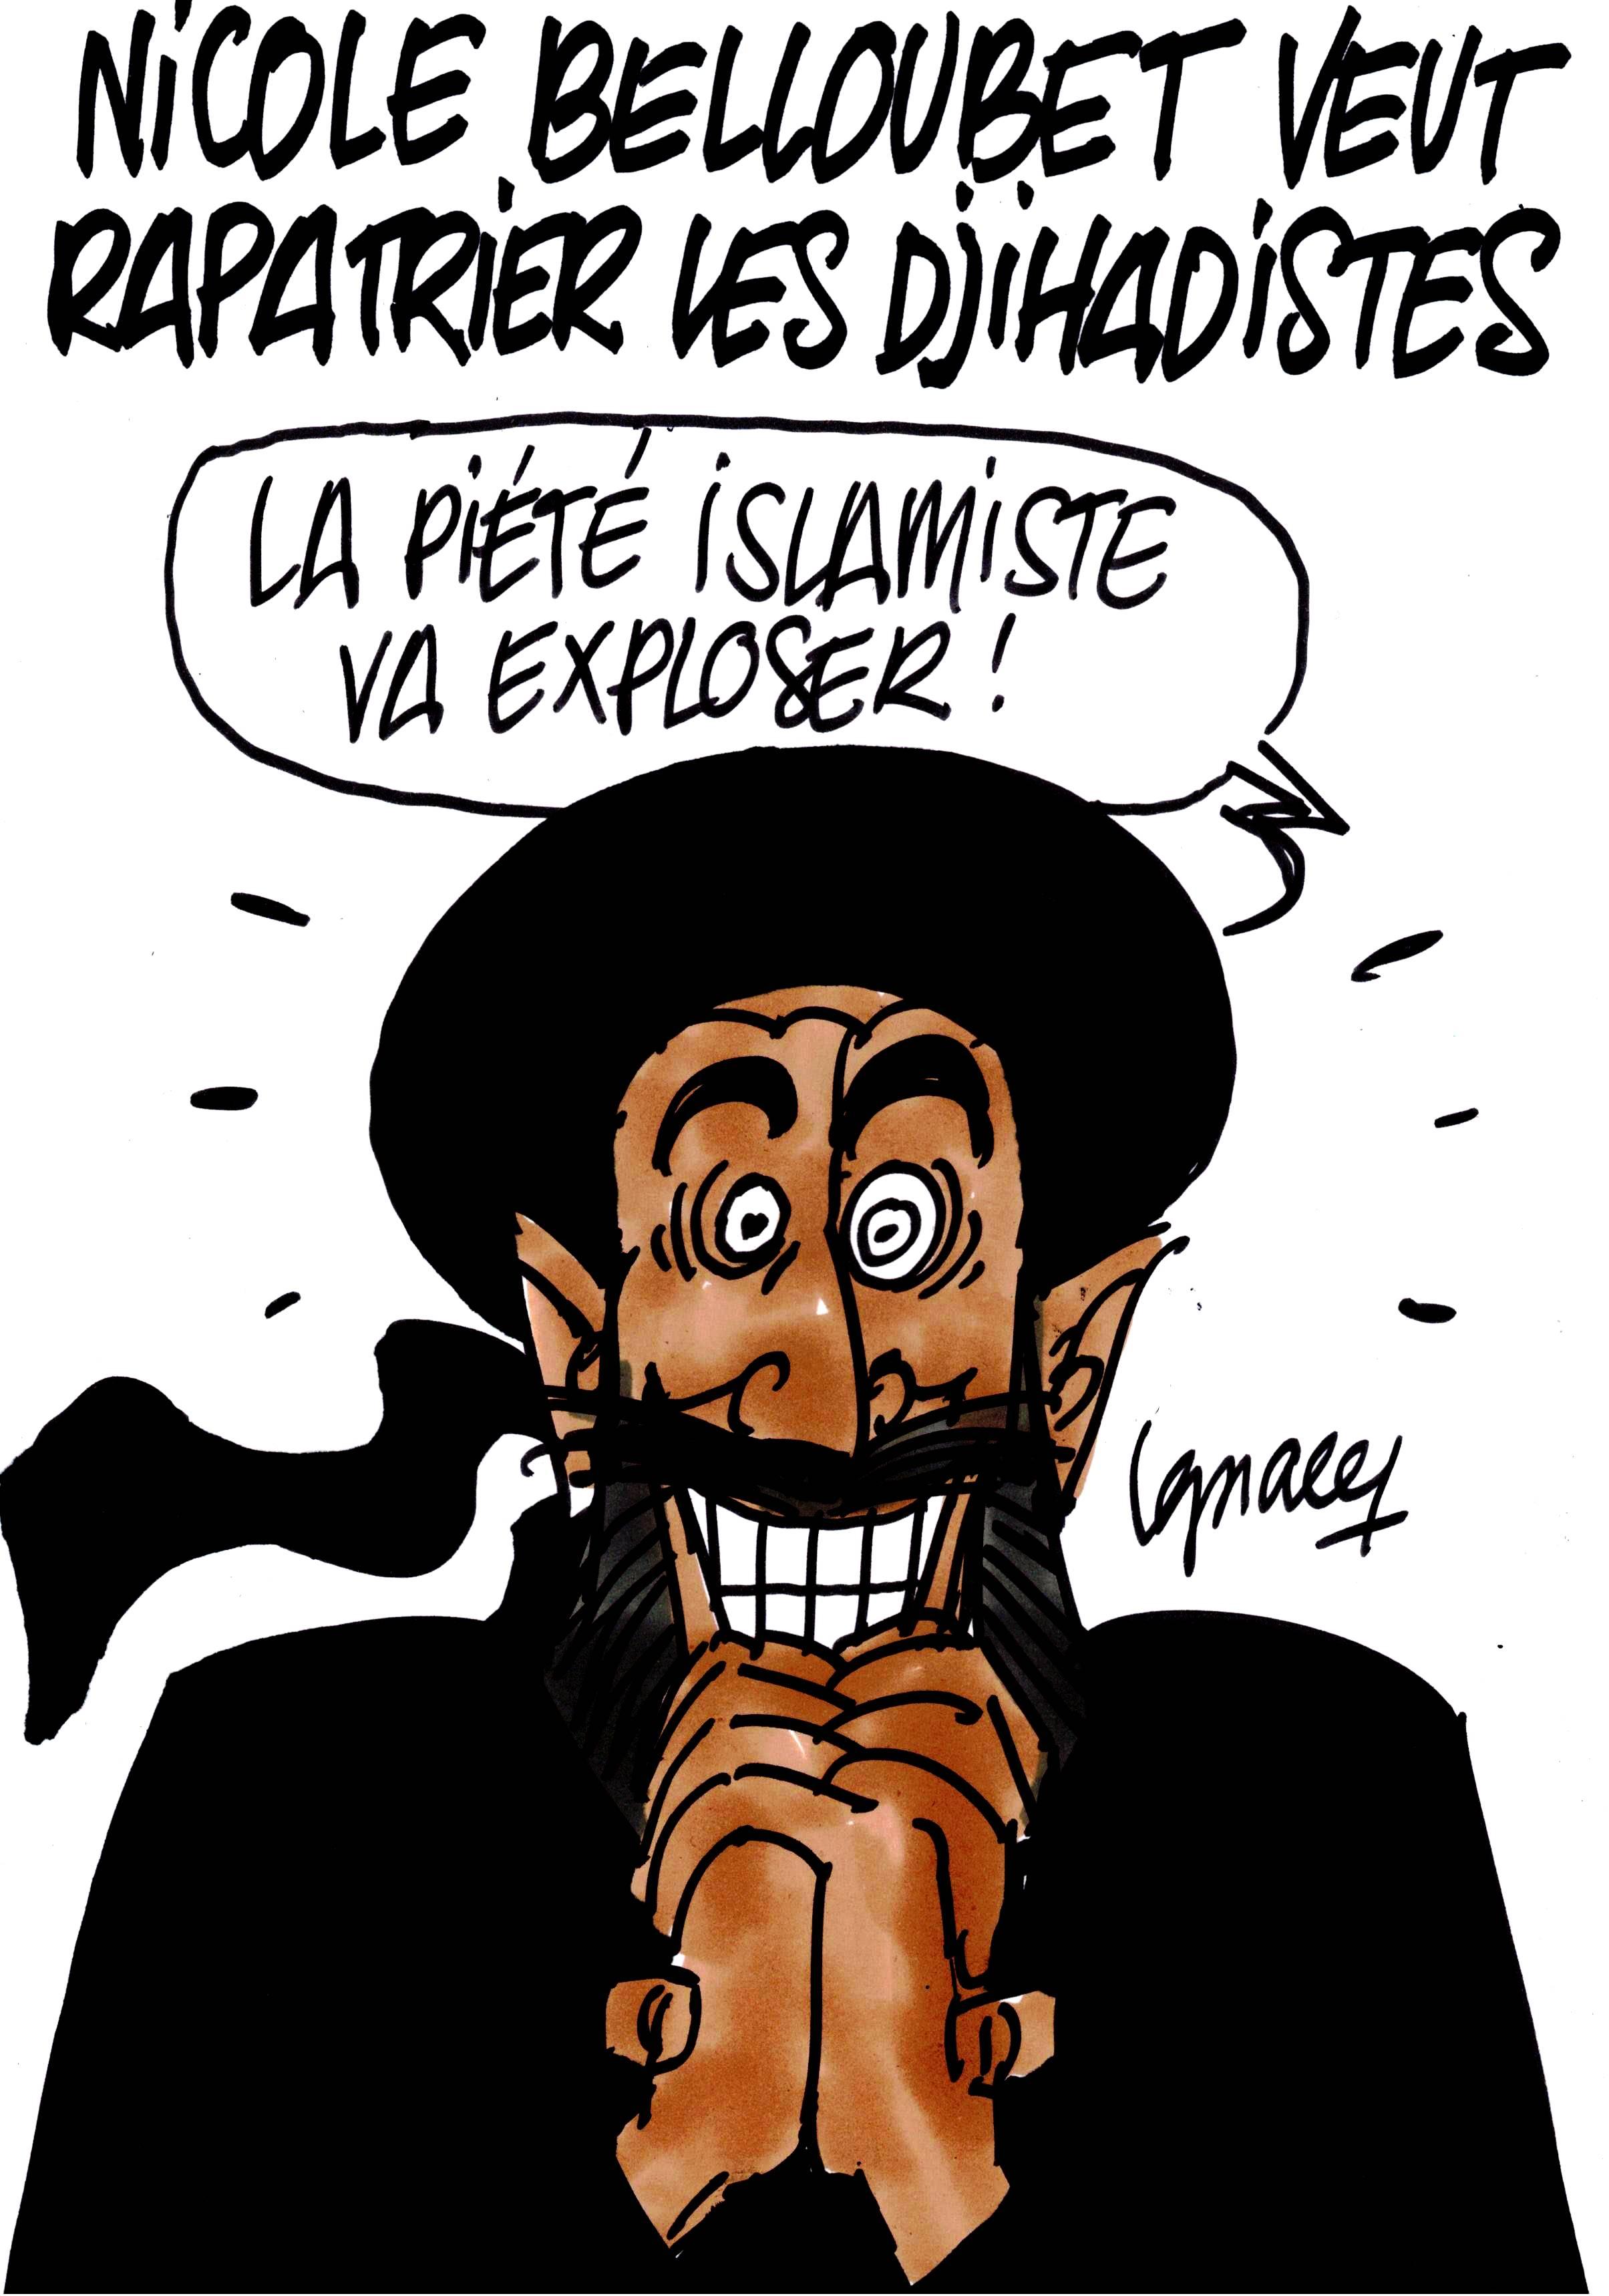 Ignace - Belloubet veut rapatrier les djihadistes